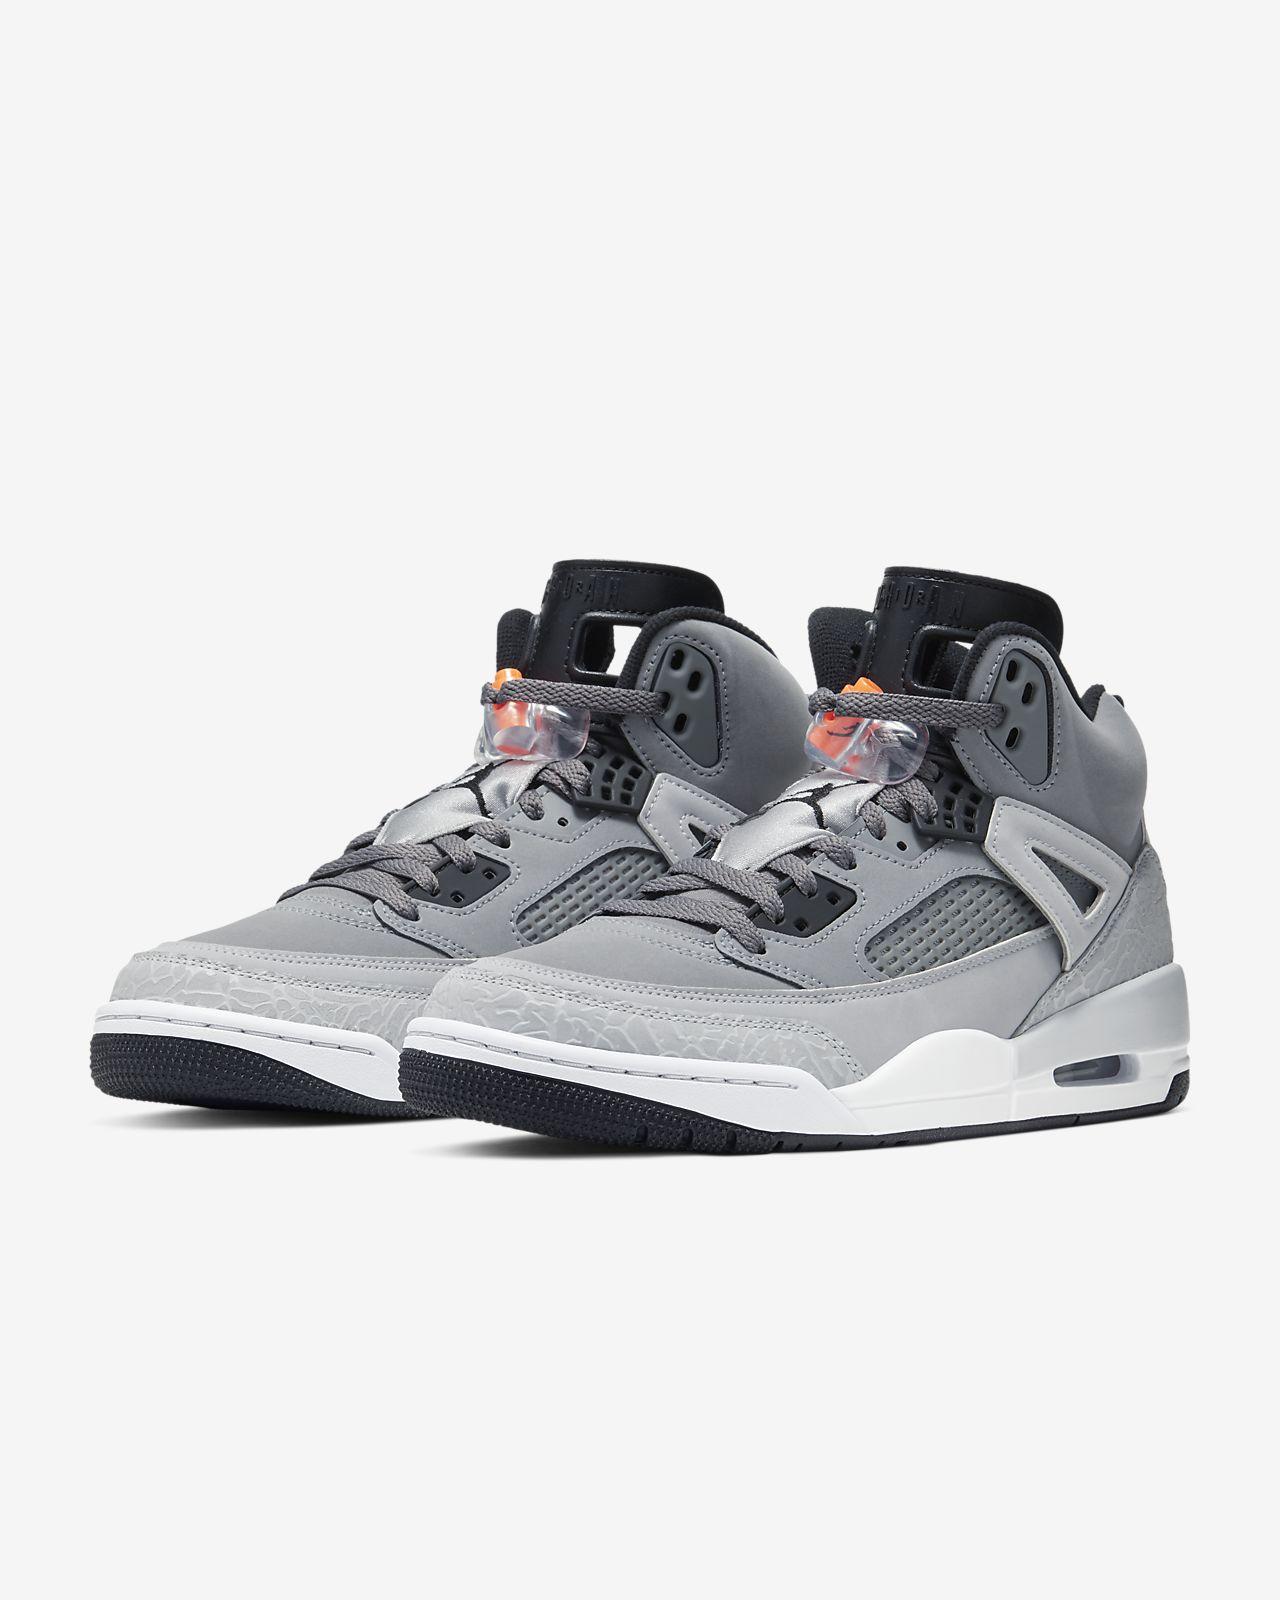 Nike chaussures pour Nouveau hommesNike Spi'Zike Jordan J3Fl1cKT